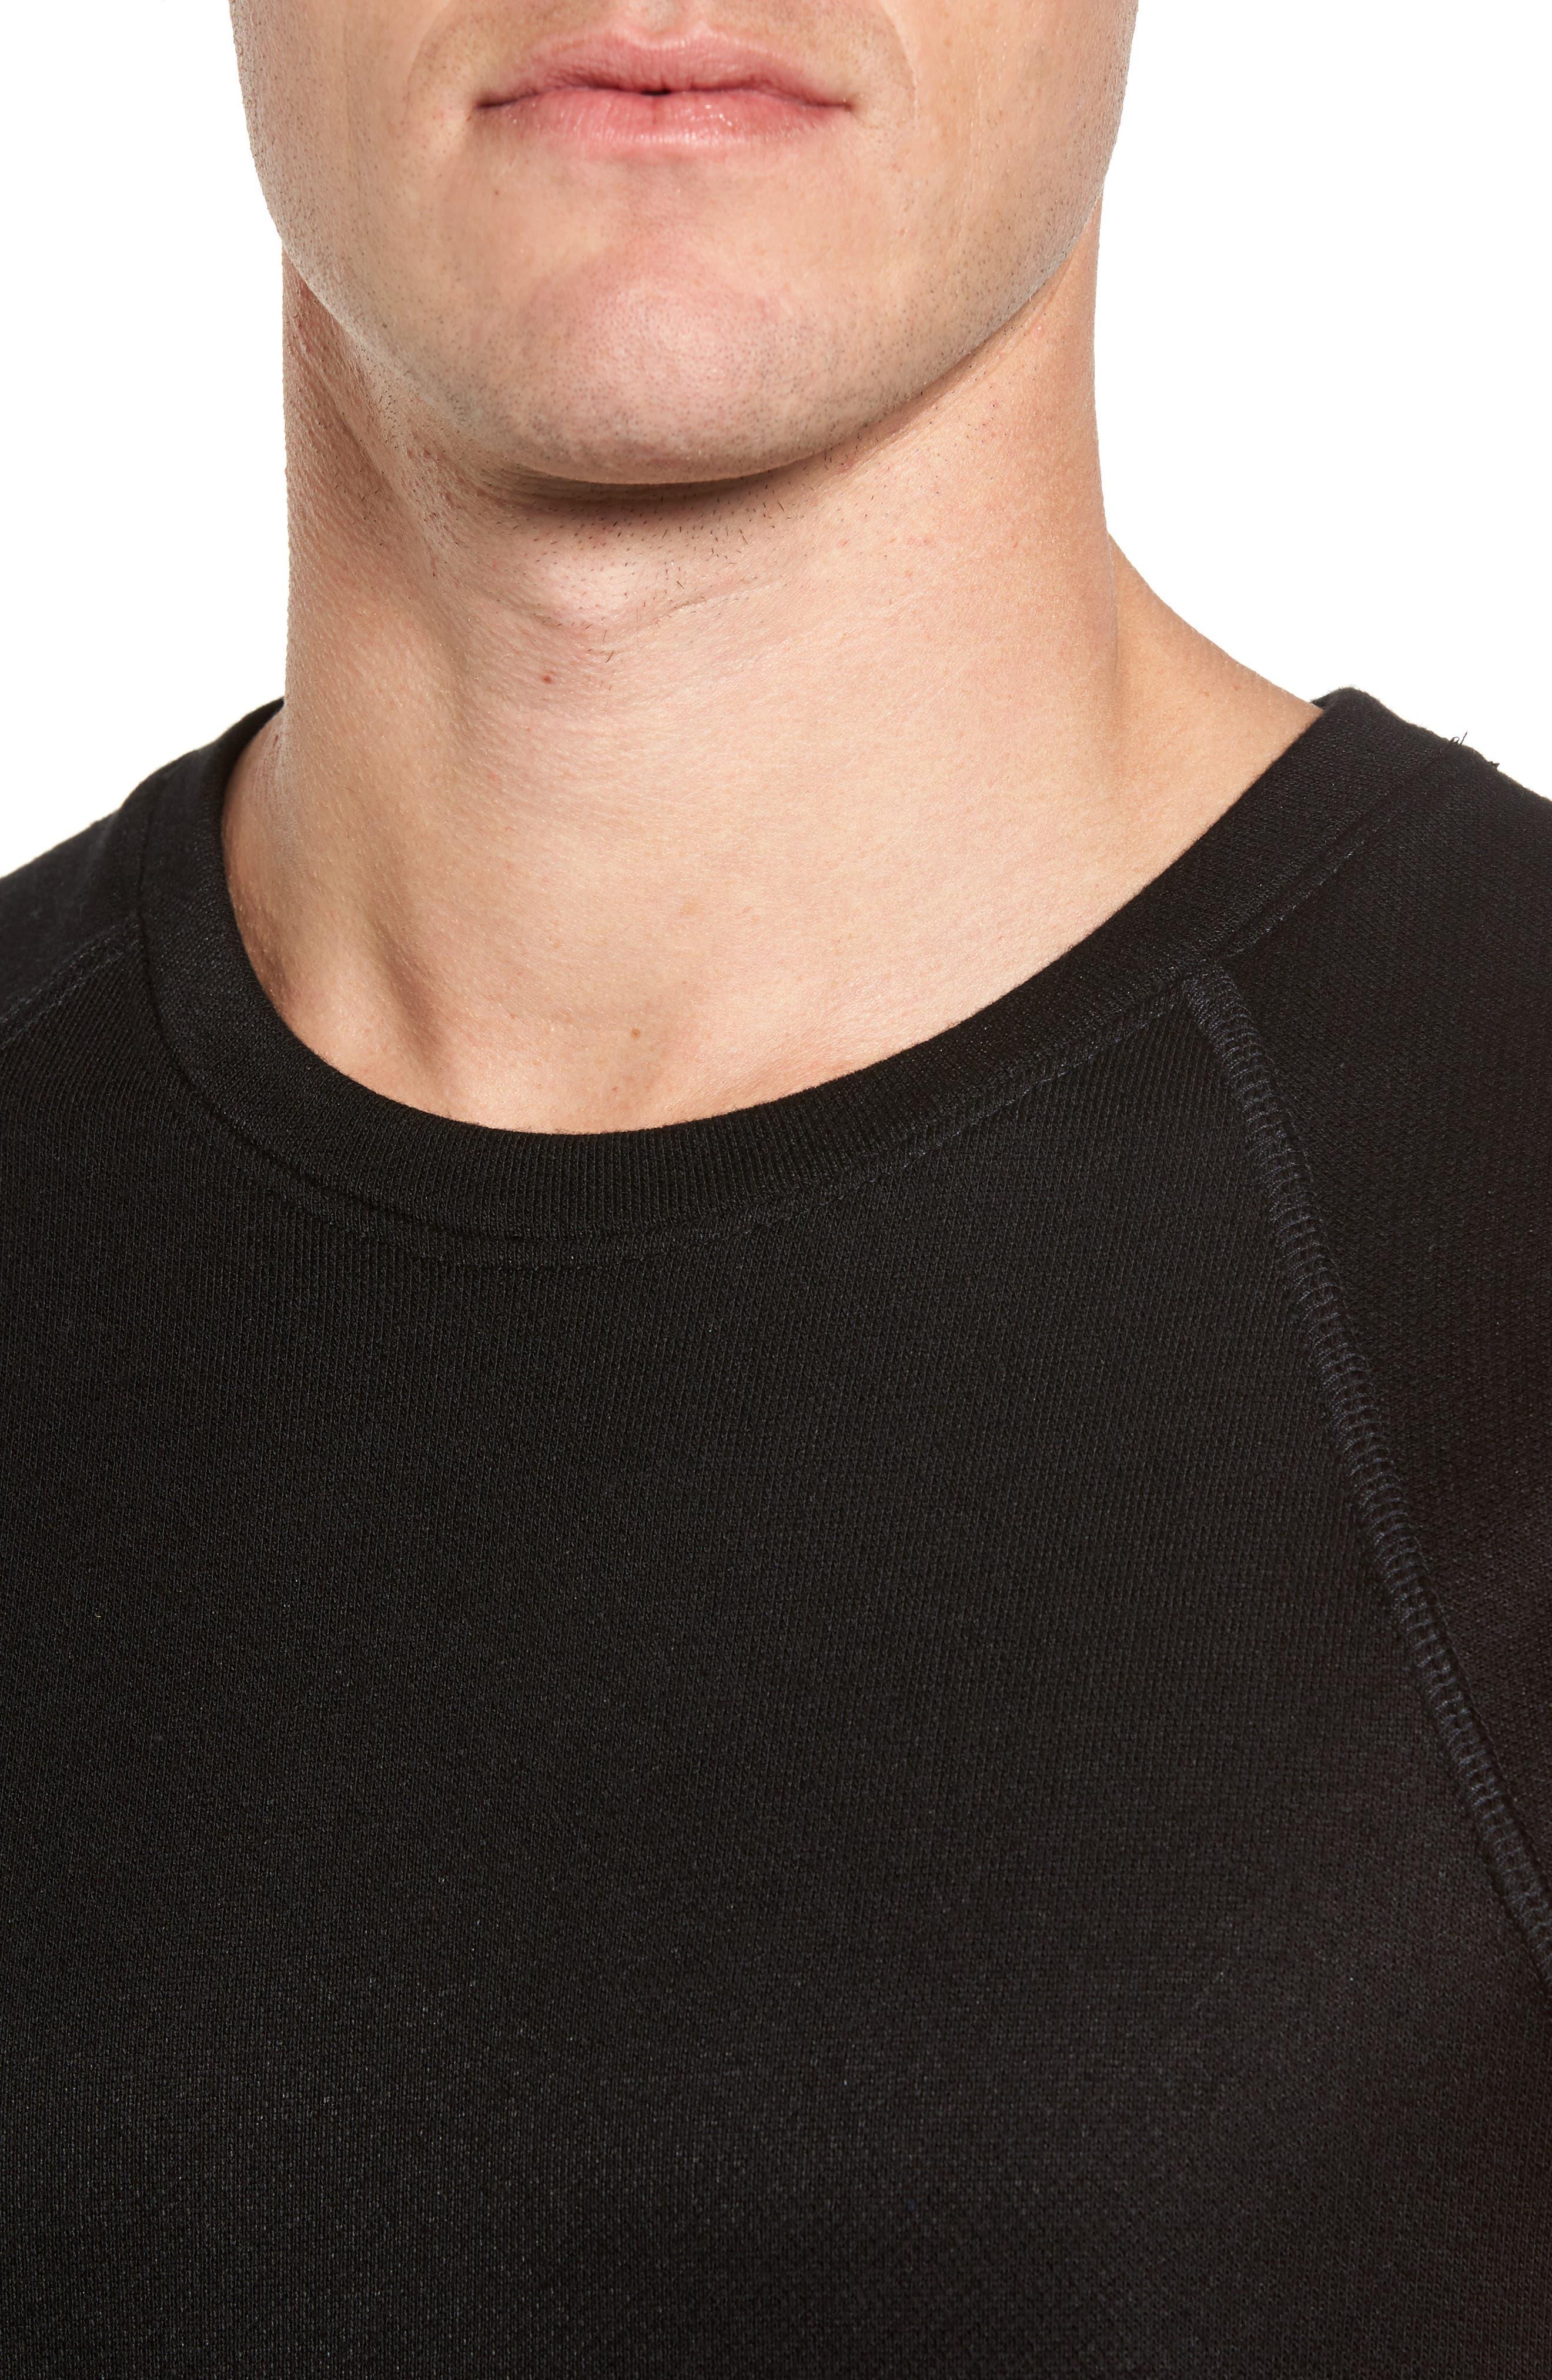 ALO, Dosha Relaxed Fit Sweatshirt Tank, Alternate thumbnail 4, color, BLACK